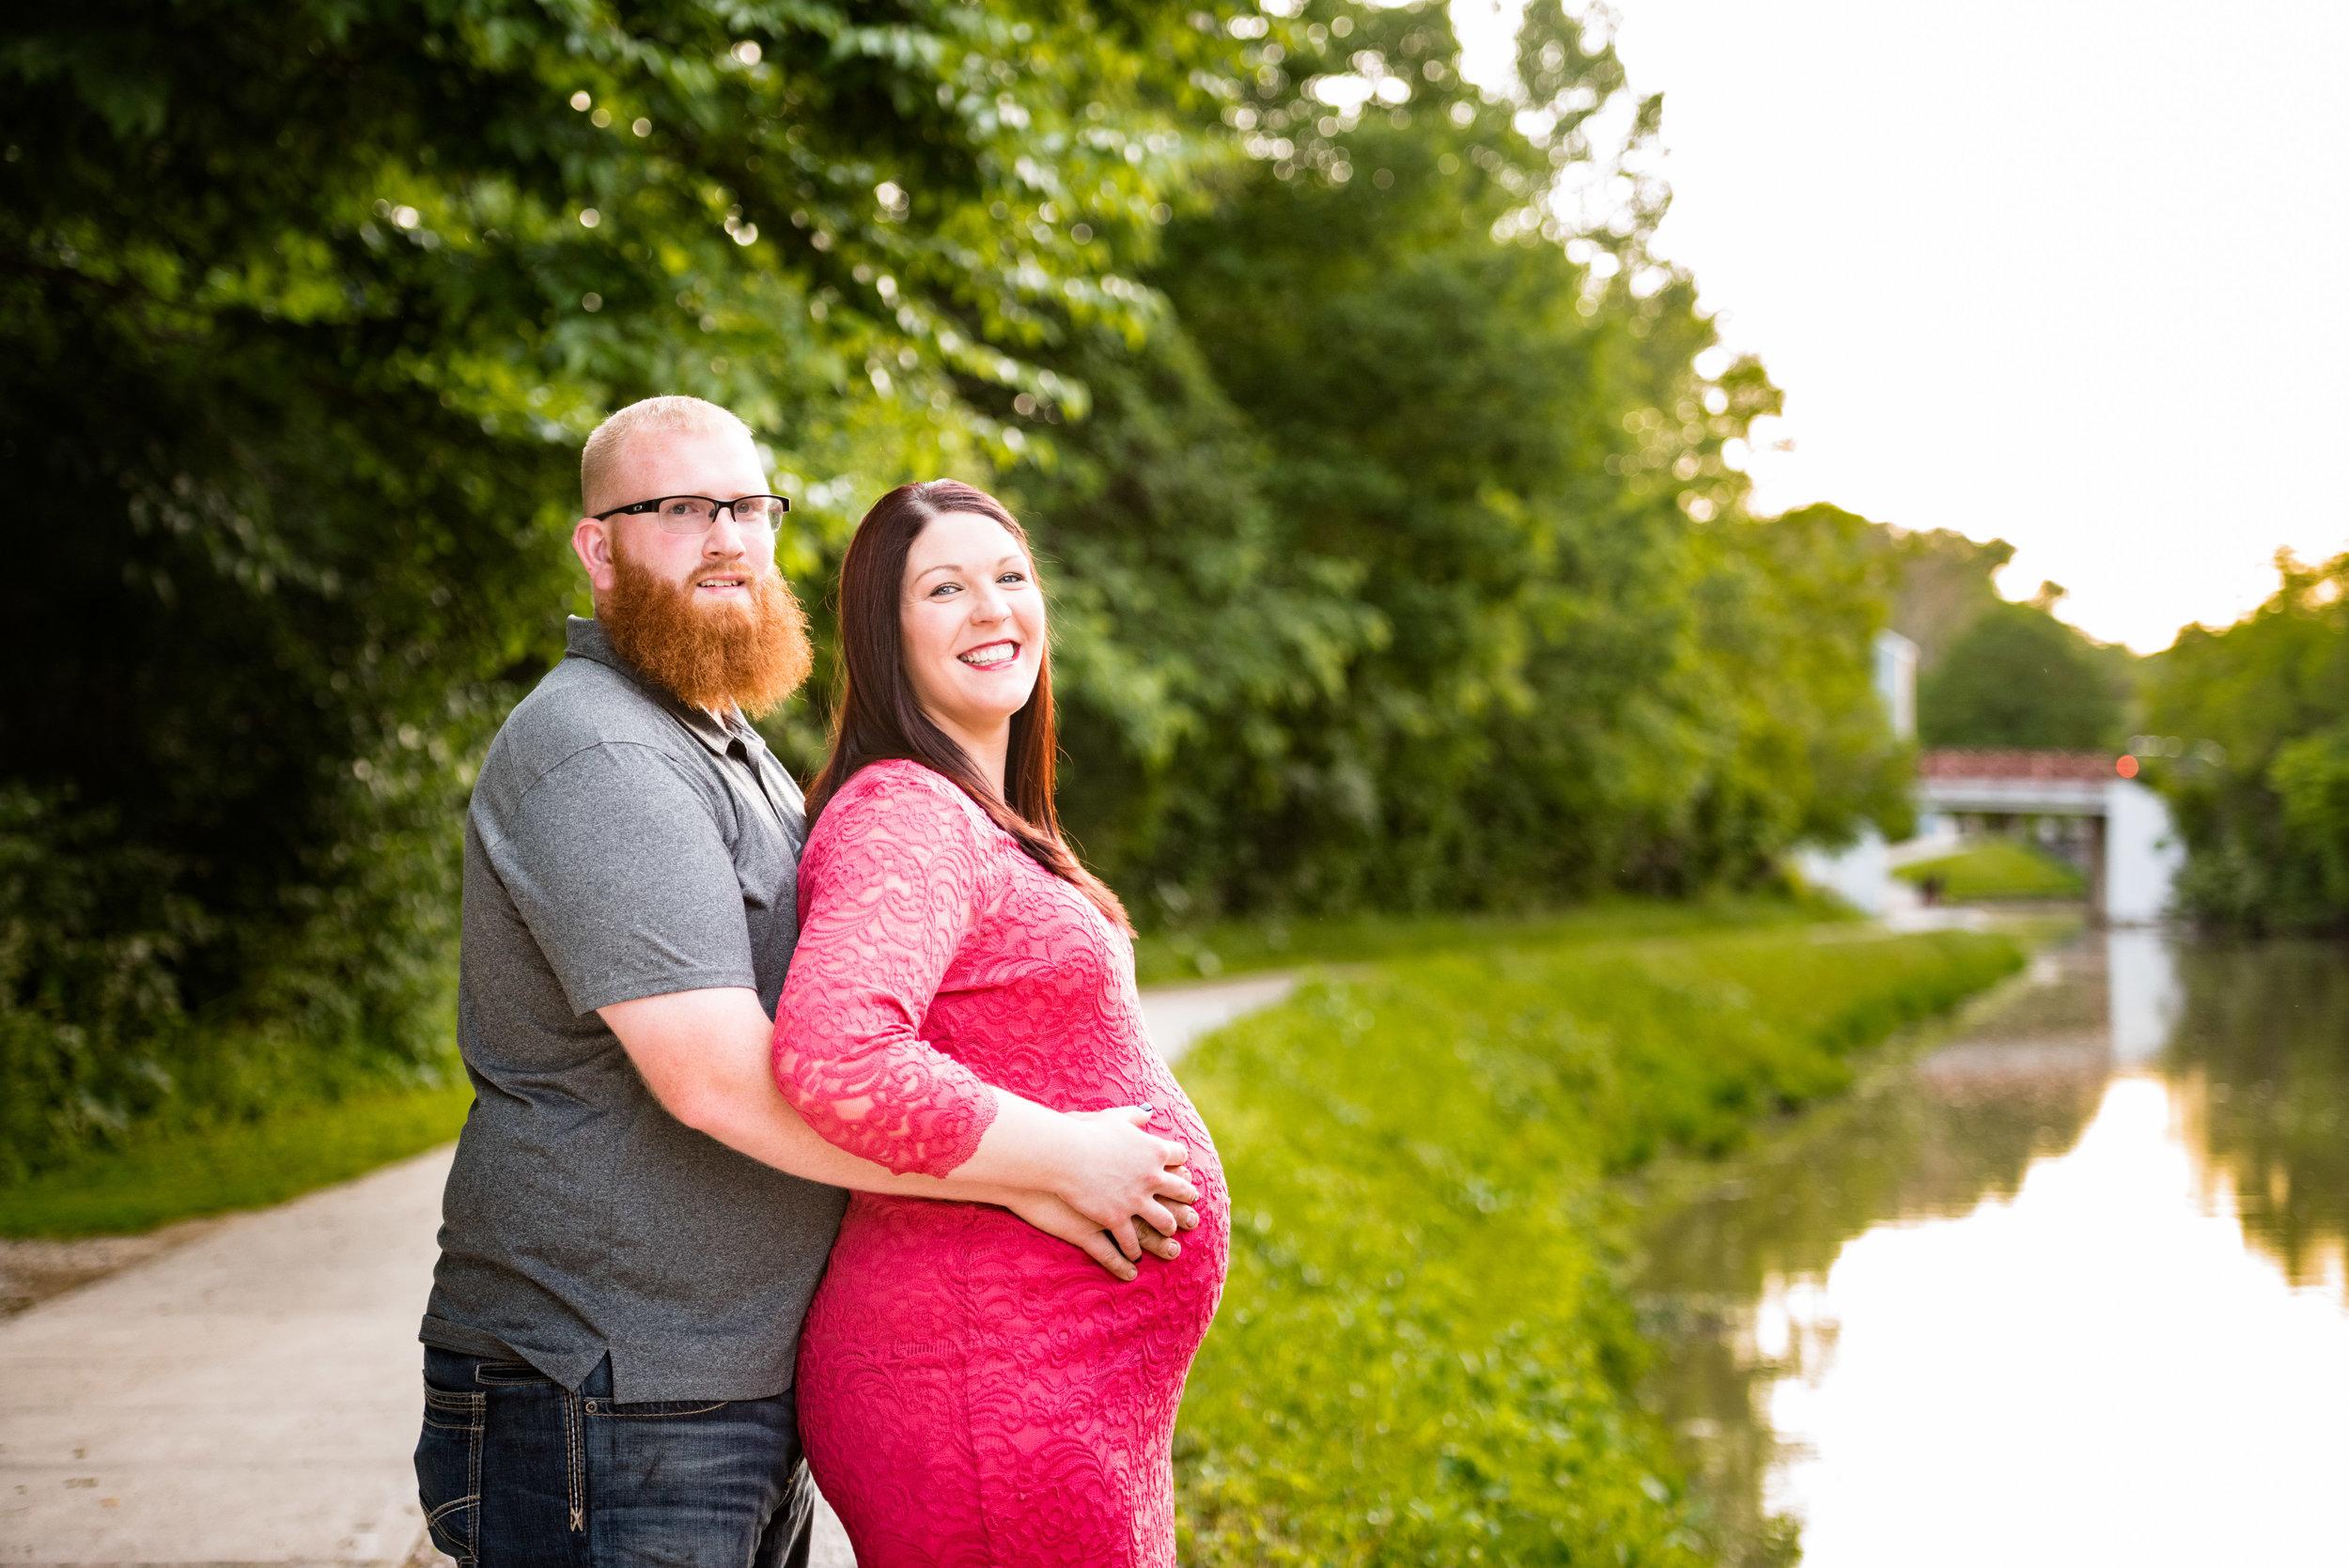 bowling green maternity photos